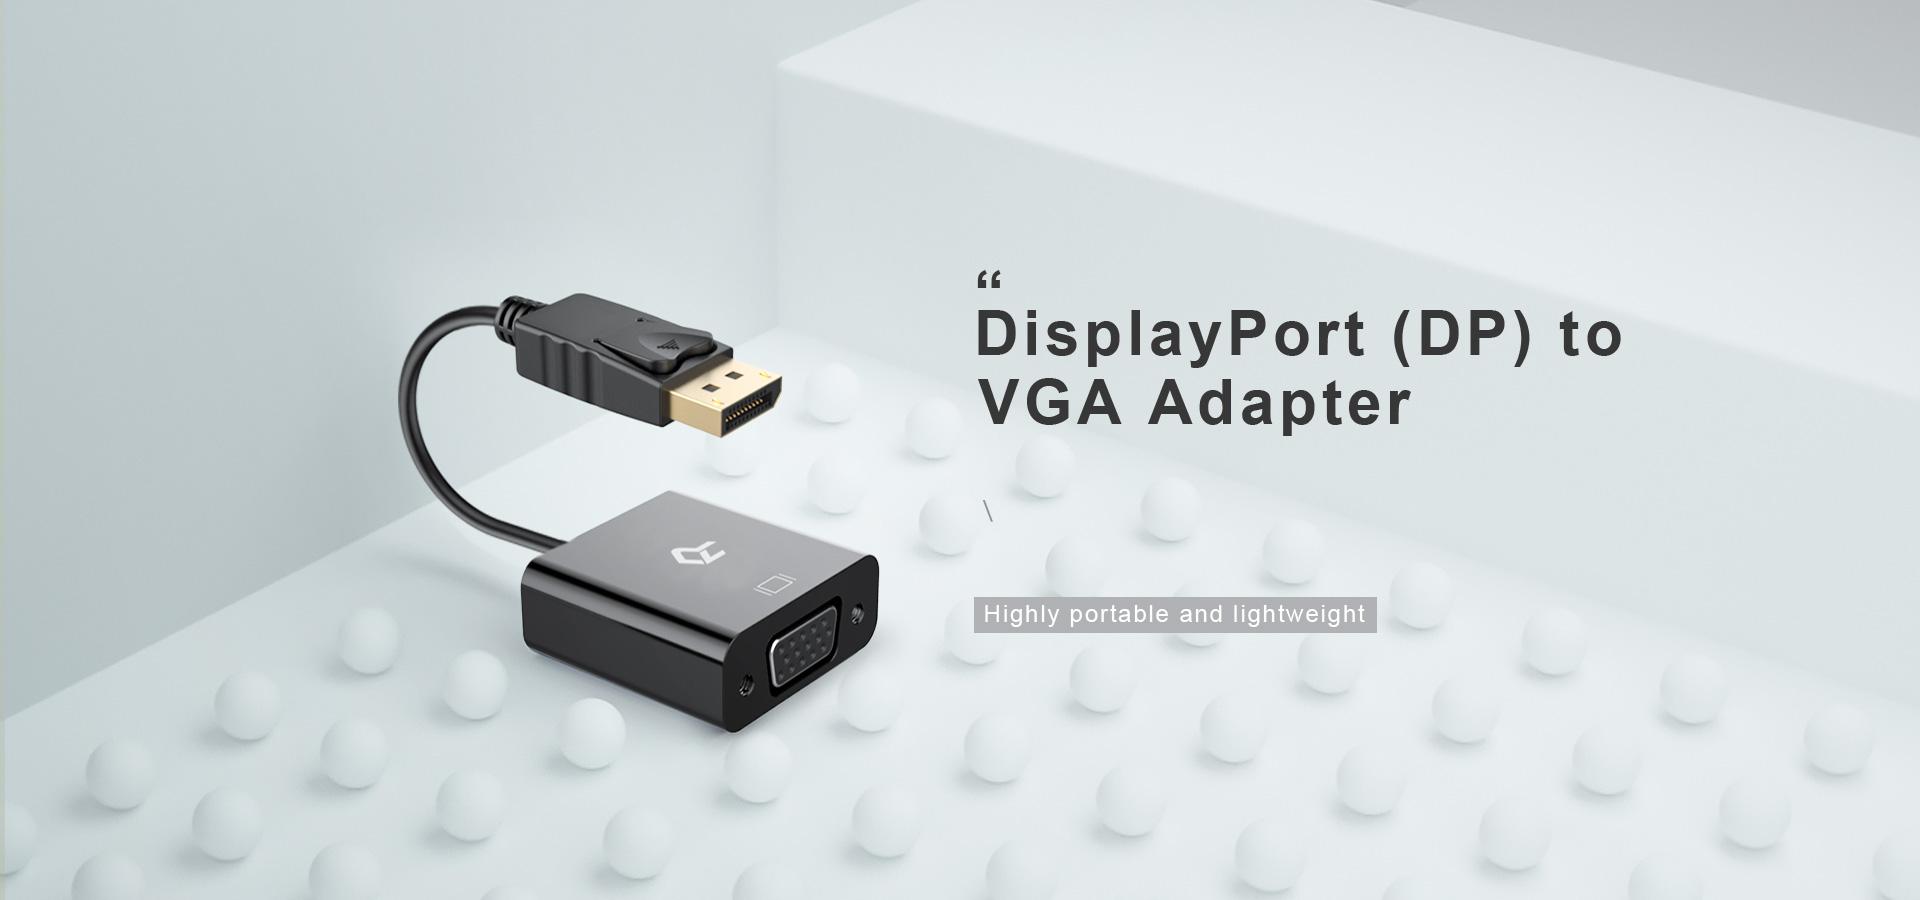 DisplayPort (DP) to VGA Adapter